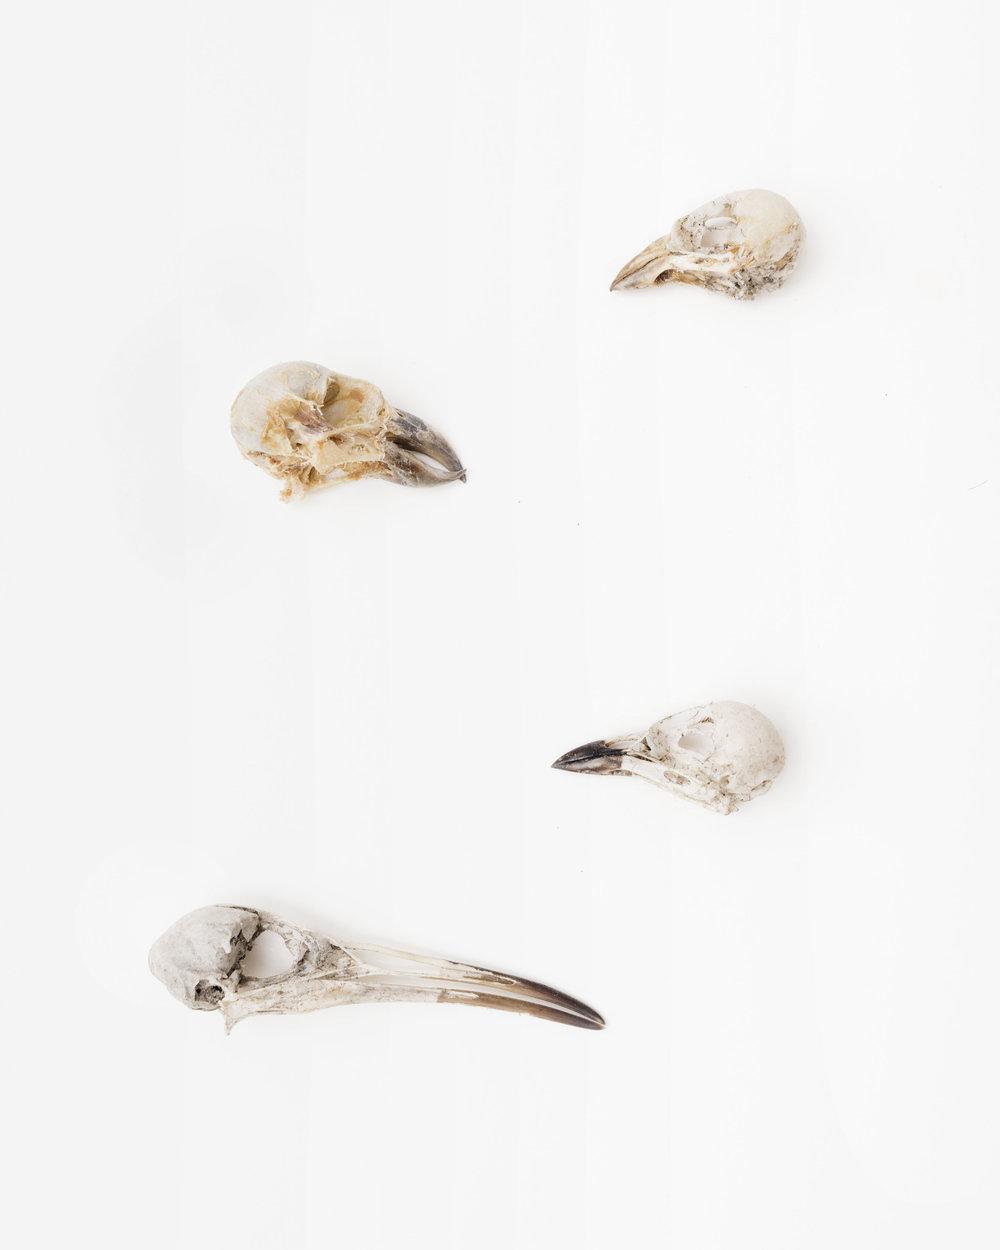 Skulls:Bachman's Sparrow (Peucaea aestivalis)Red Crossbill (Loxia curvirostra)Yellow-Breasted Chat (Icteria virens)Virginia Rail (Rallus limicola), Archival inkjet print,14 x 11,$200